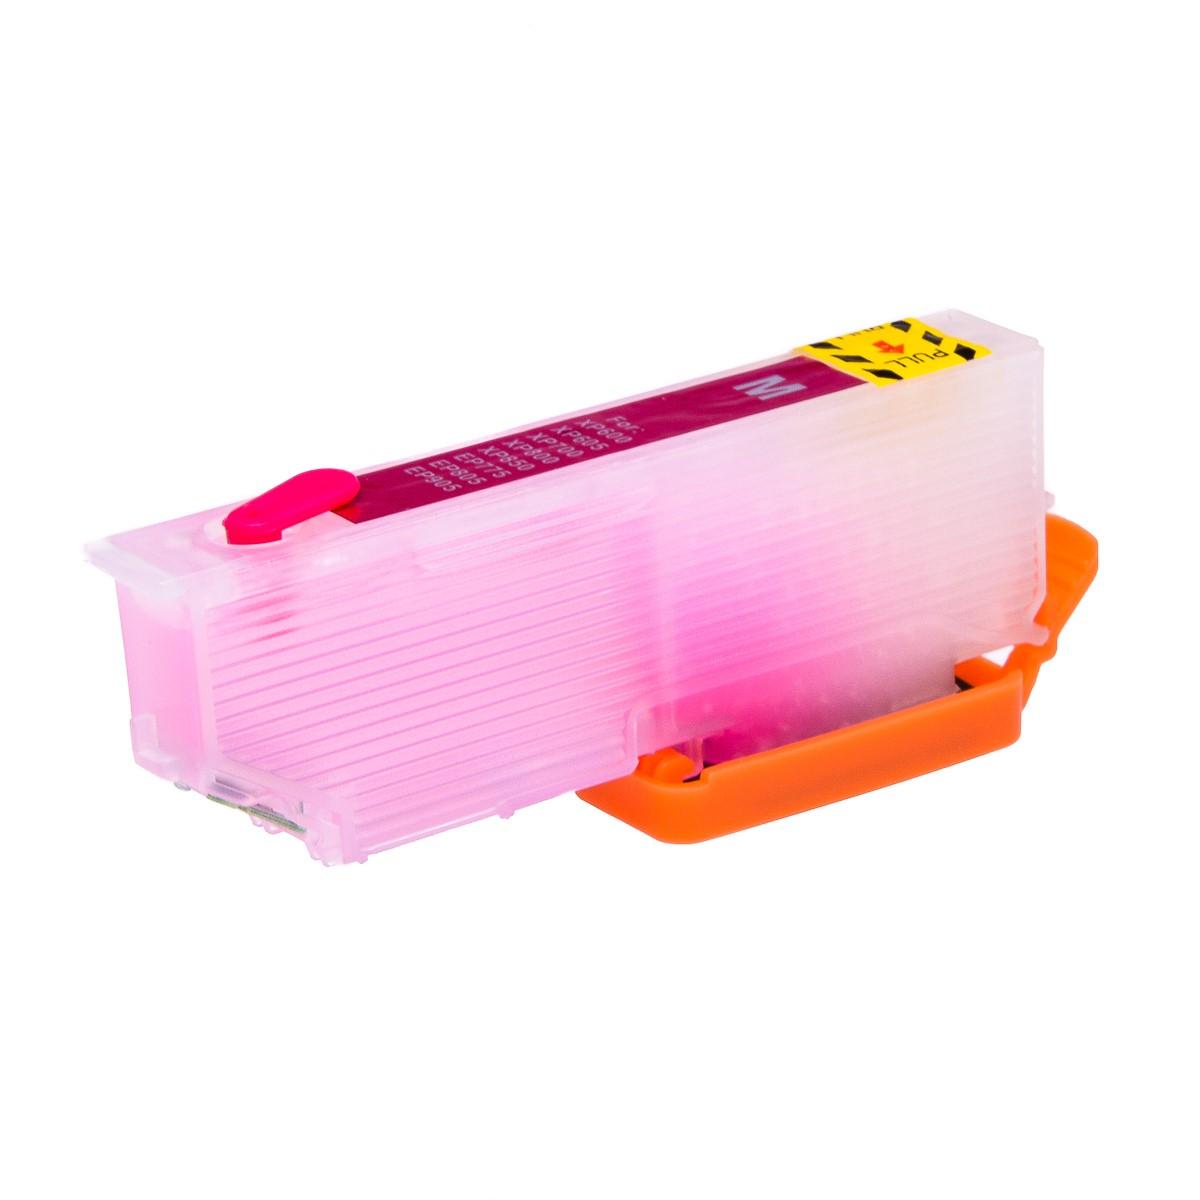 Magenta printhead cleaning cartridge for Epson XP-645 printer